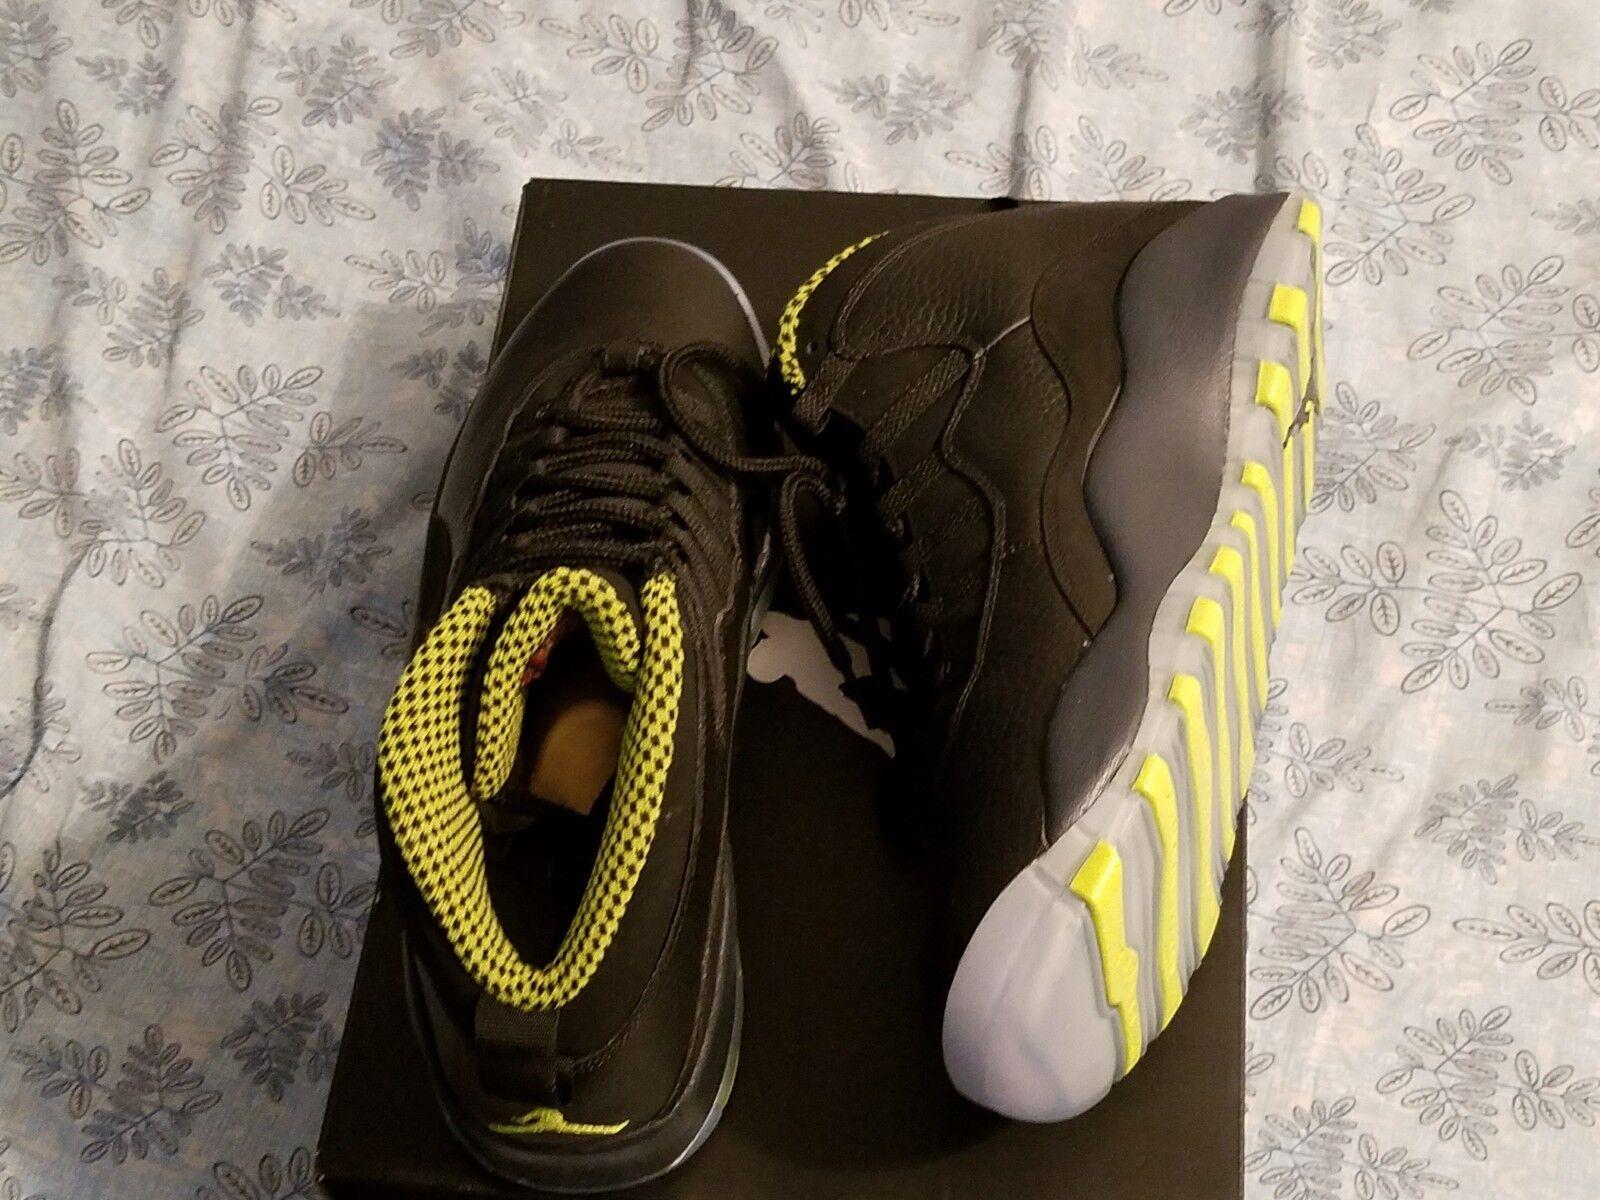 Nike Air Jordan 10 Retro Black VNM Green-CL GRY-ANTHRCT Size 10.5  Venom Green